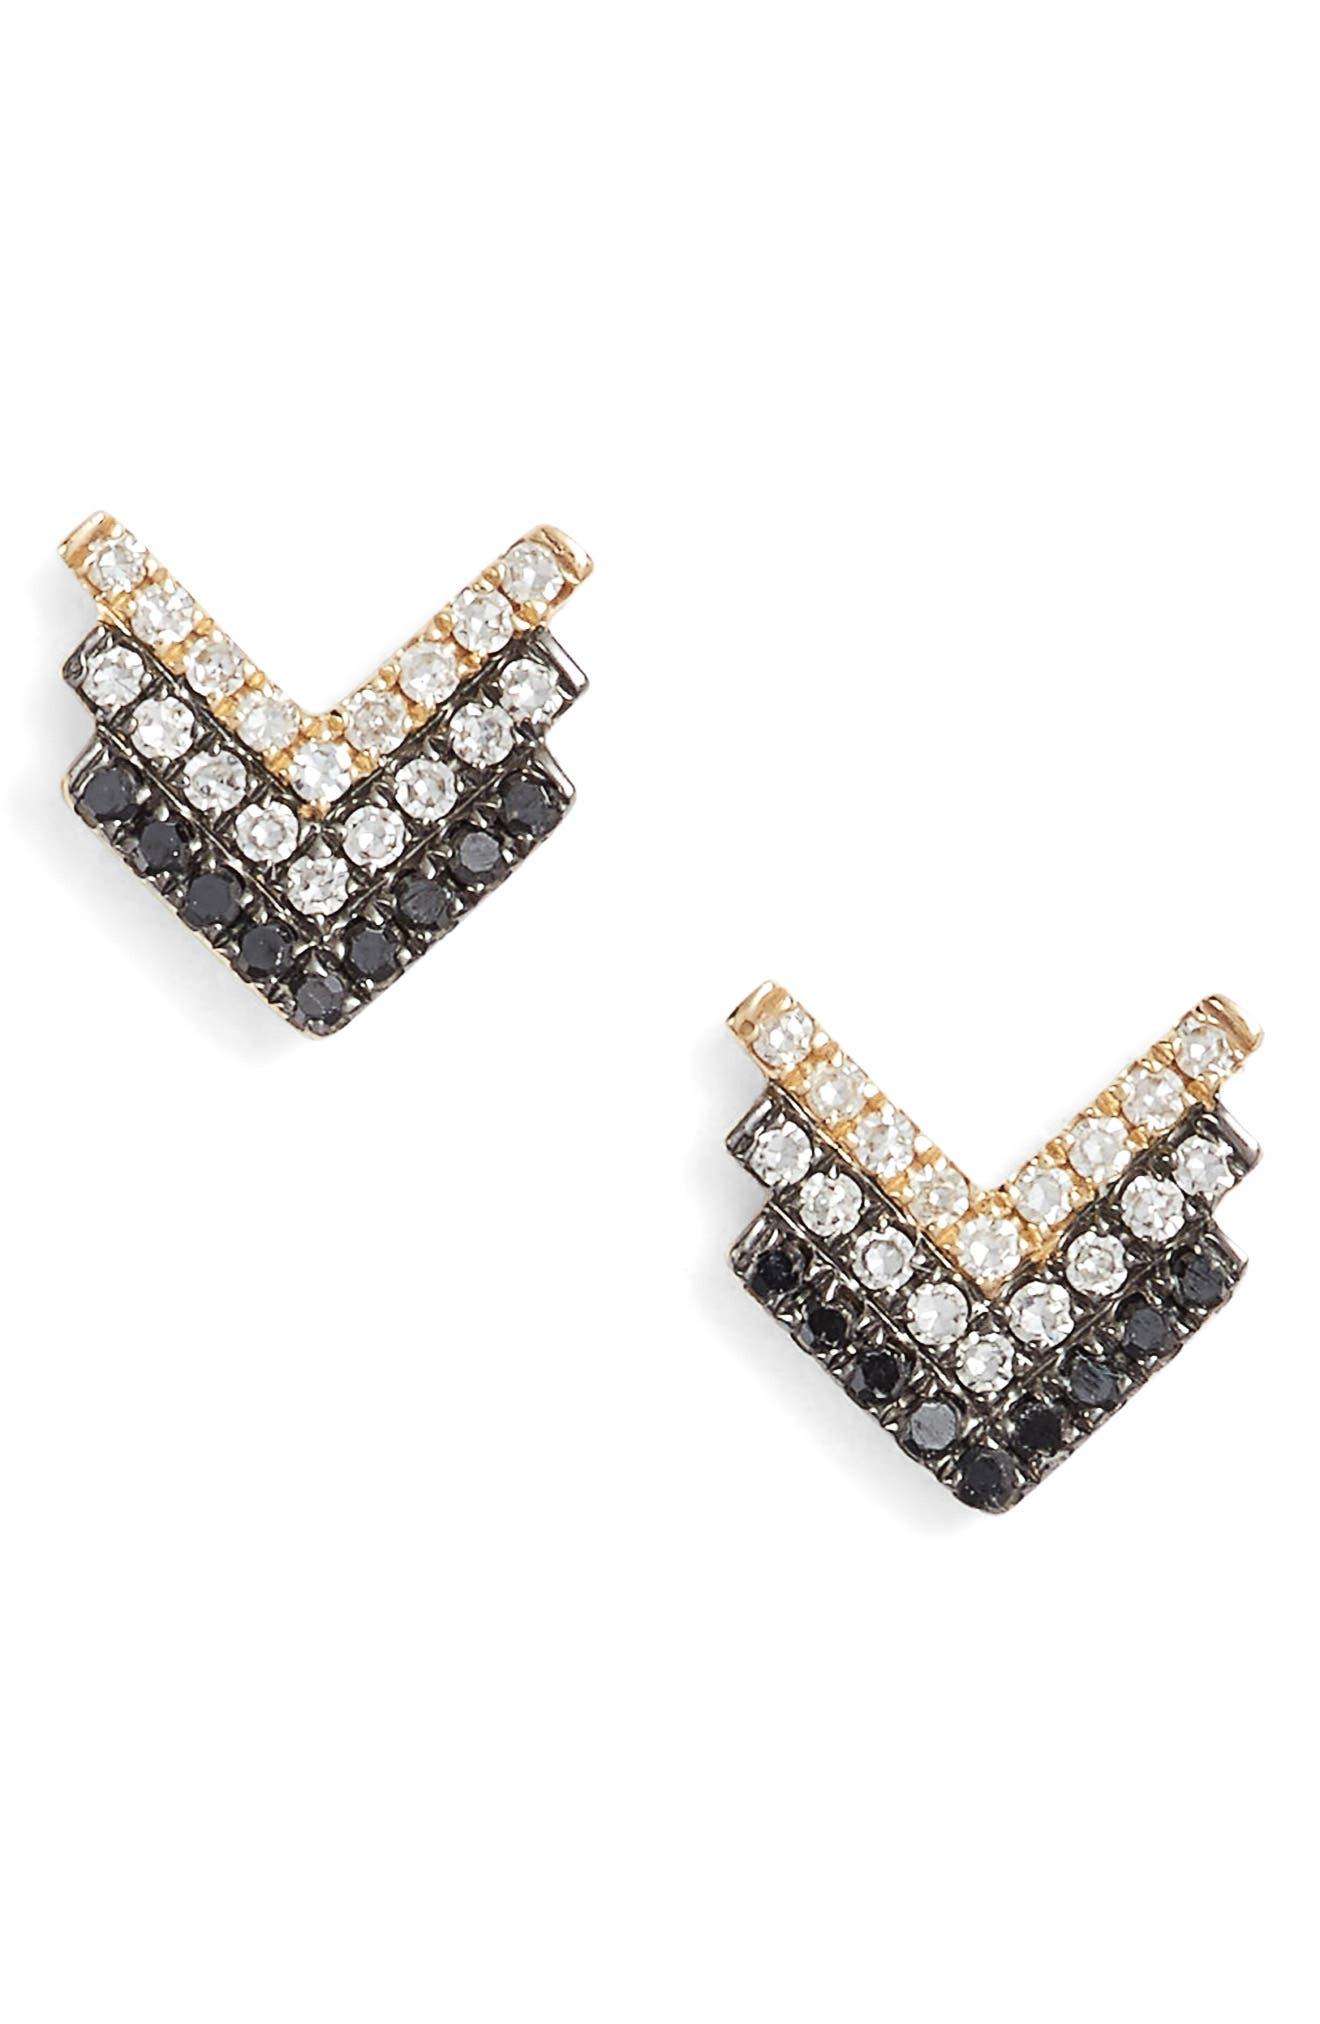 Chevron Diamond Stud Earrings,                             Main thumbnail 1, color,                             710